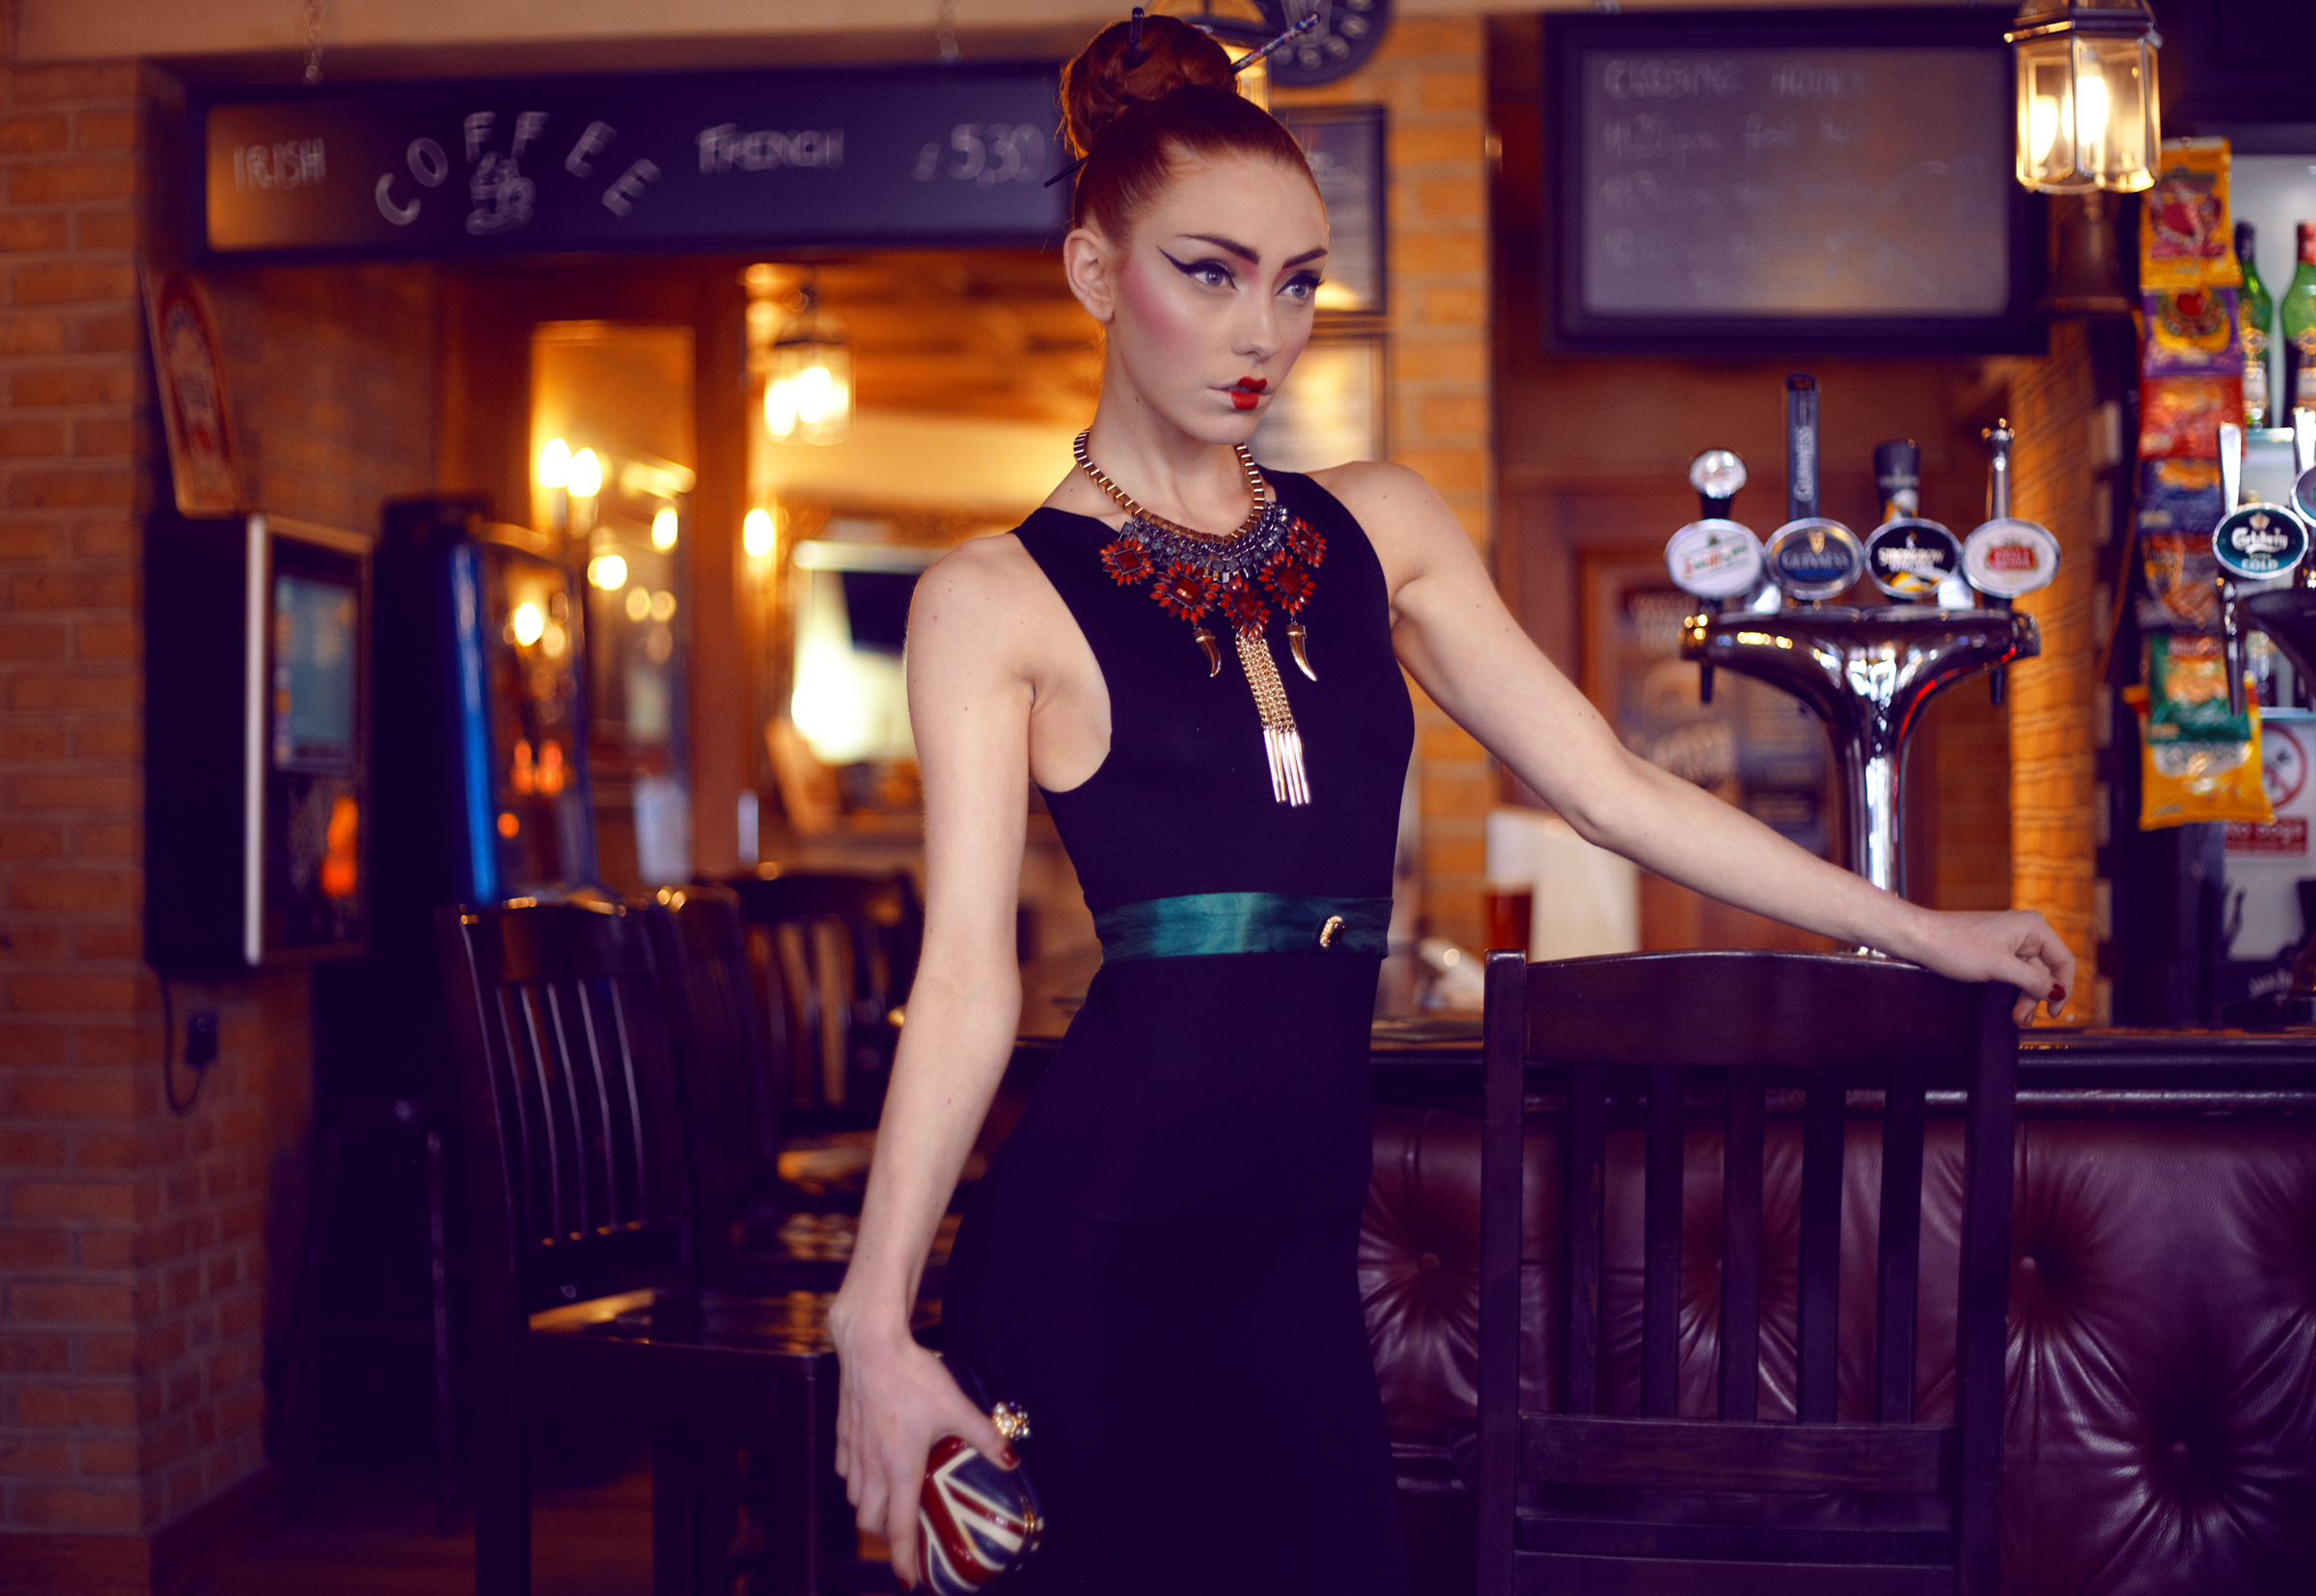 JC-GEISHA---RIO-DEBOLLA-Models1UK-Melissa-Uren-Photography-FEB-2014-LOOK-60630-FINAL-WEB-V2.jpg